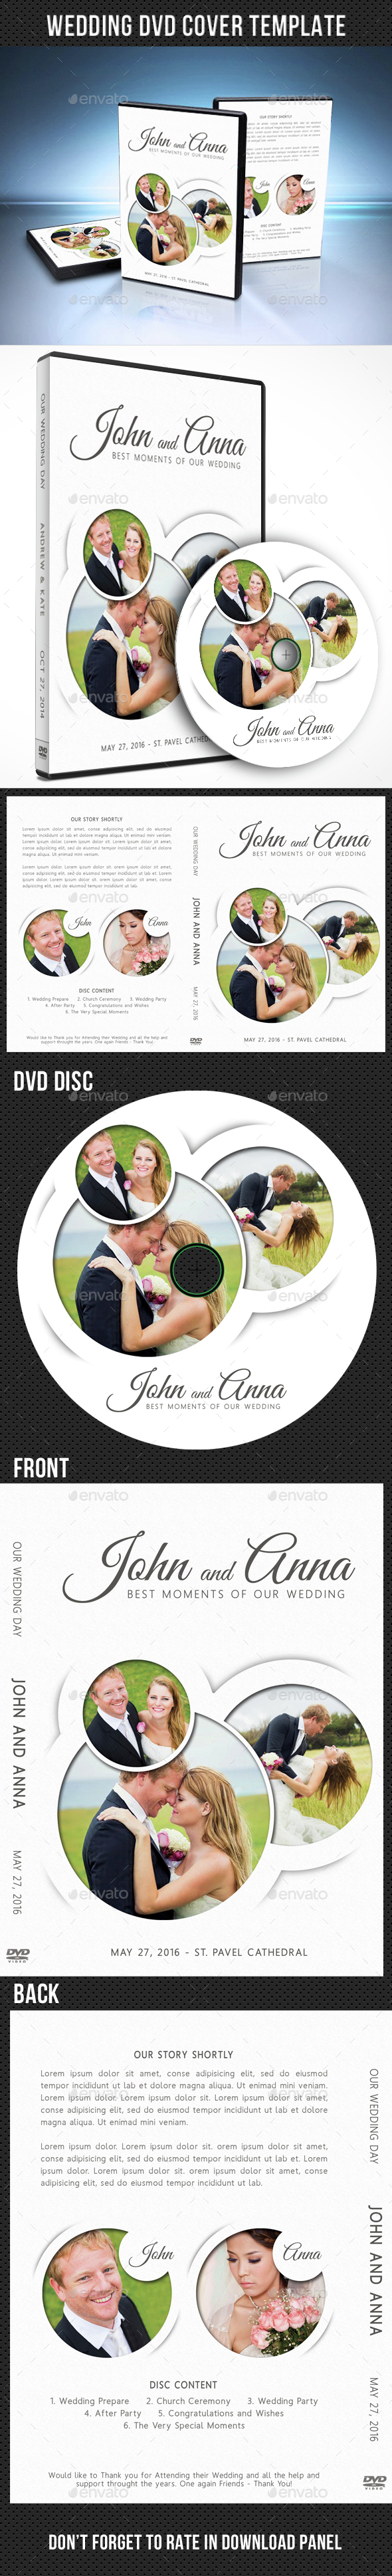 Wedding DVD Cover Template 15 - CD & DVD Artwork Print Templates